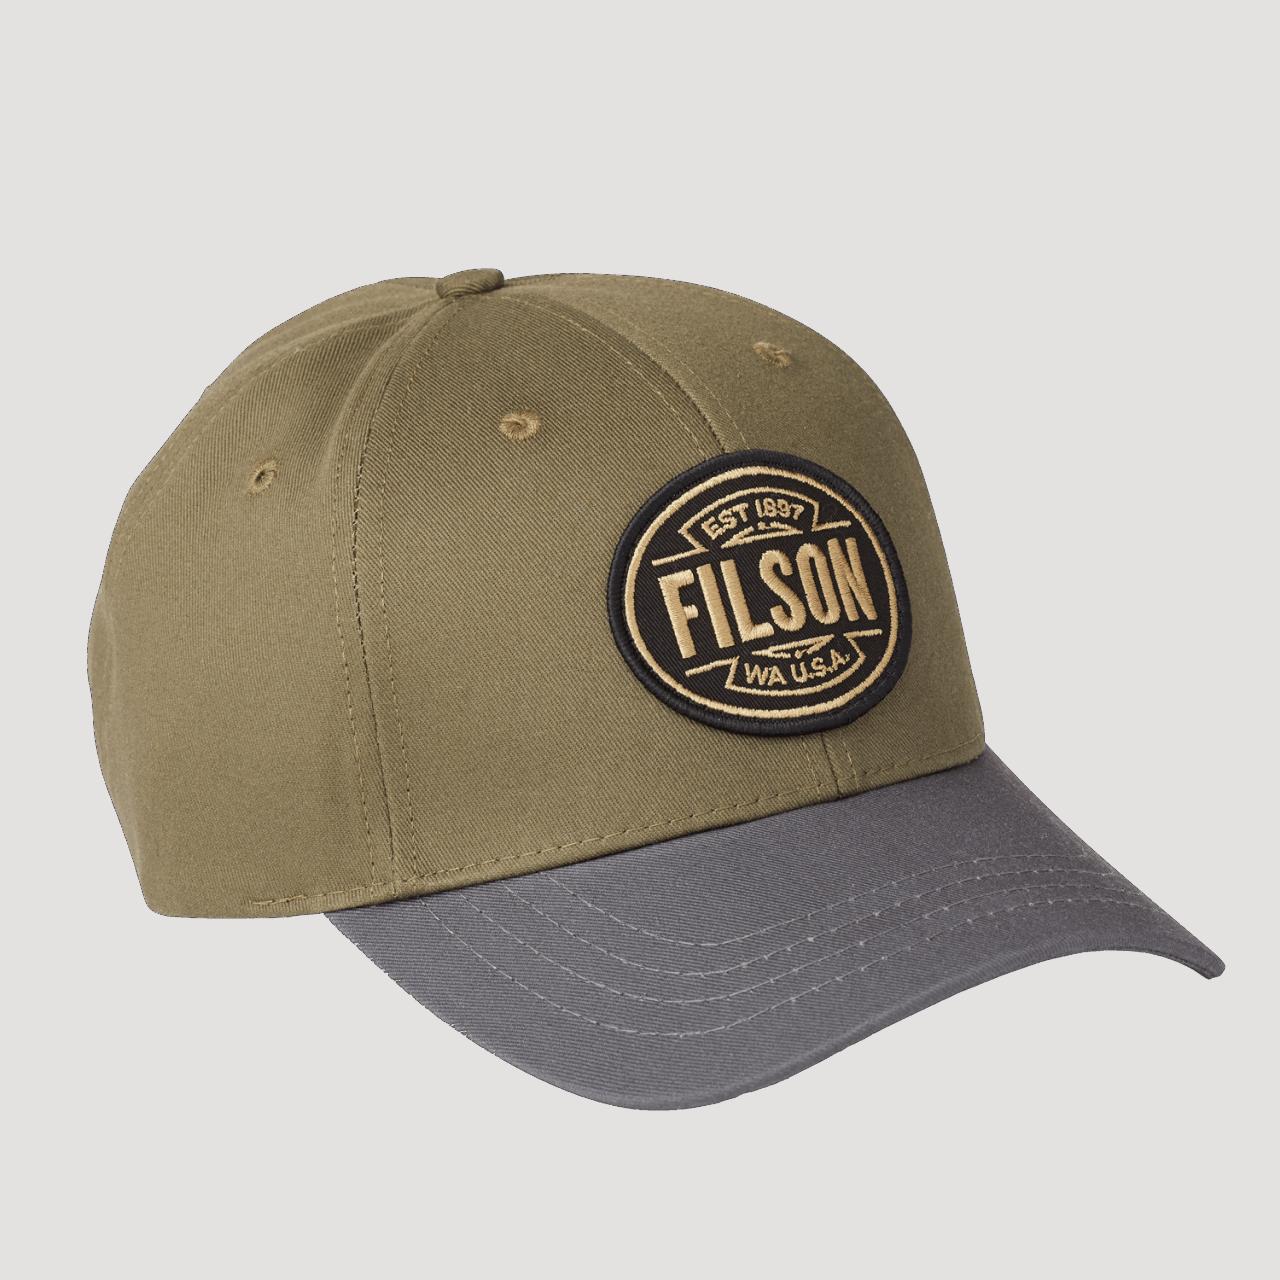 Filson Logger Cap - olive